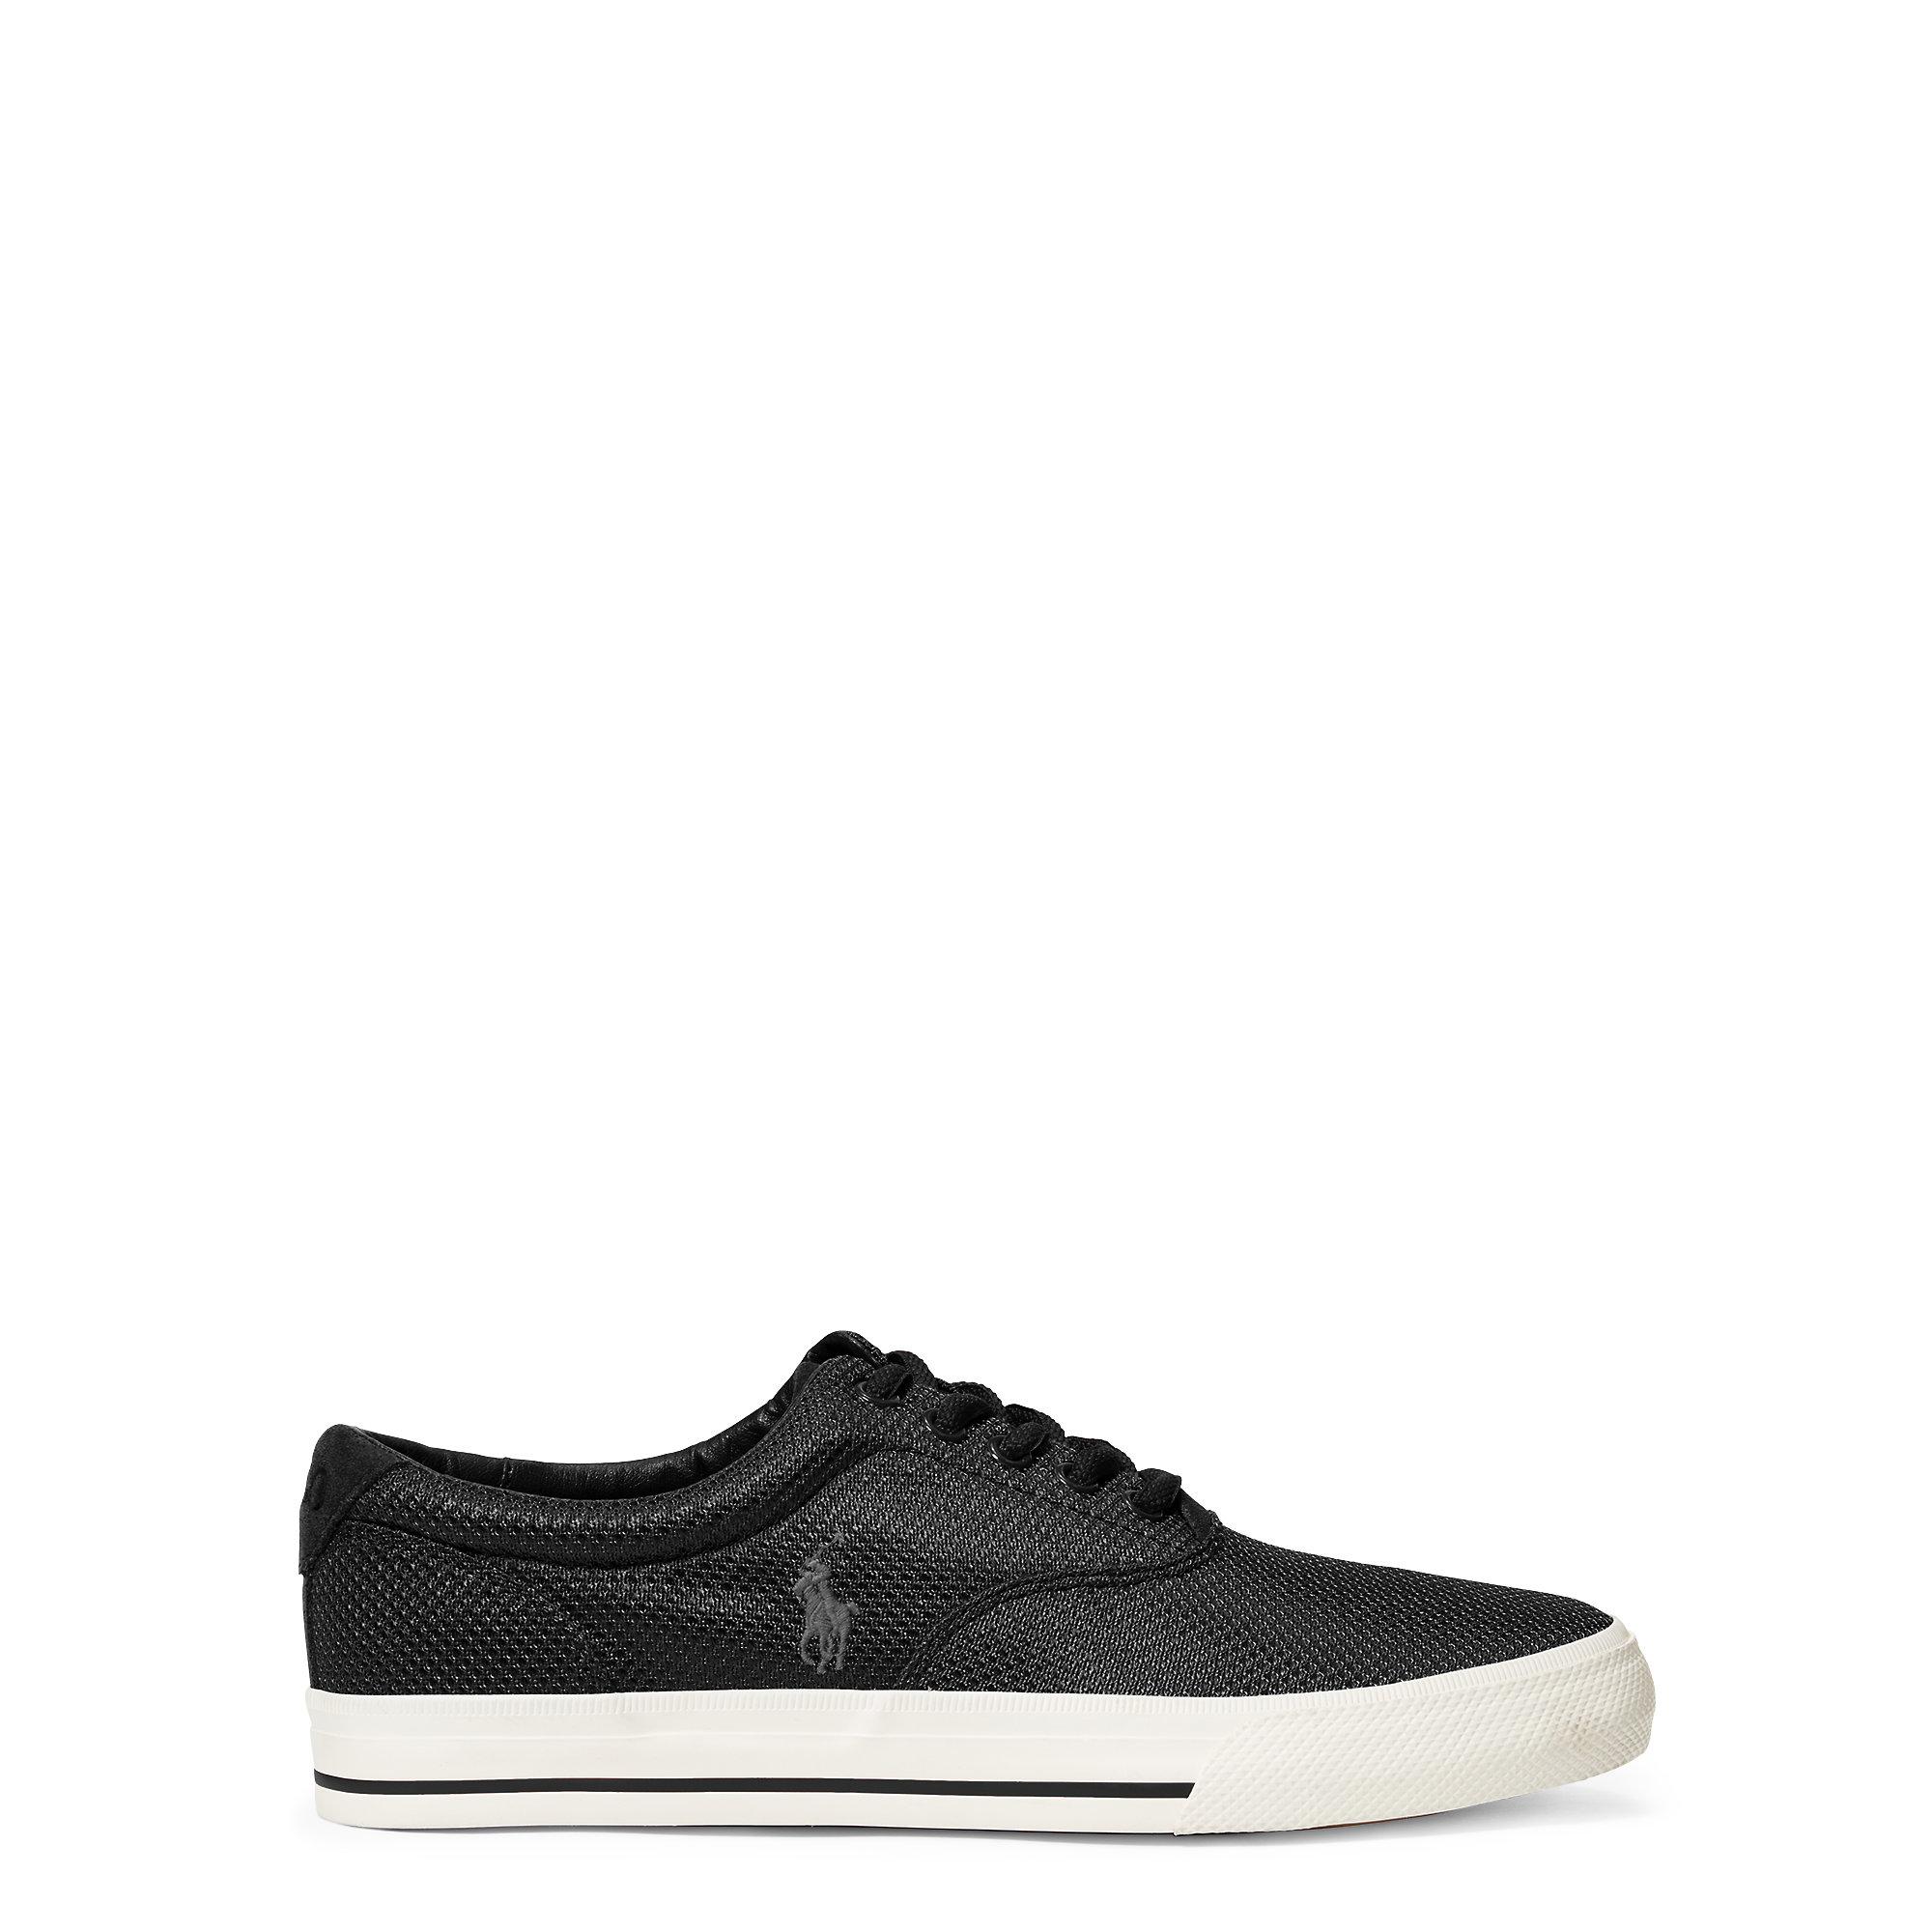 polo ralph lauren vaughn mesh sneaker in black for men lyst. Black Bedroom Furniture Sets. Home Design Ideas